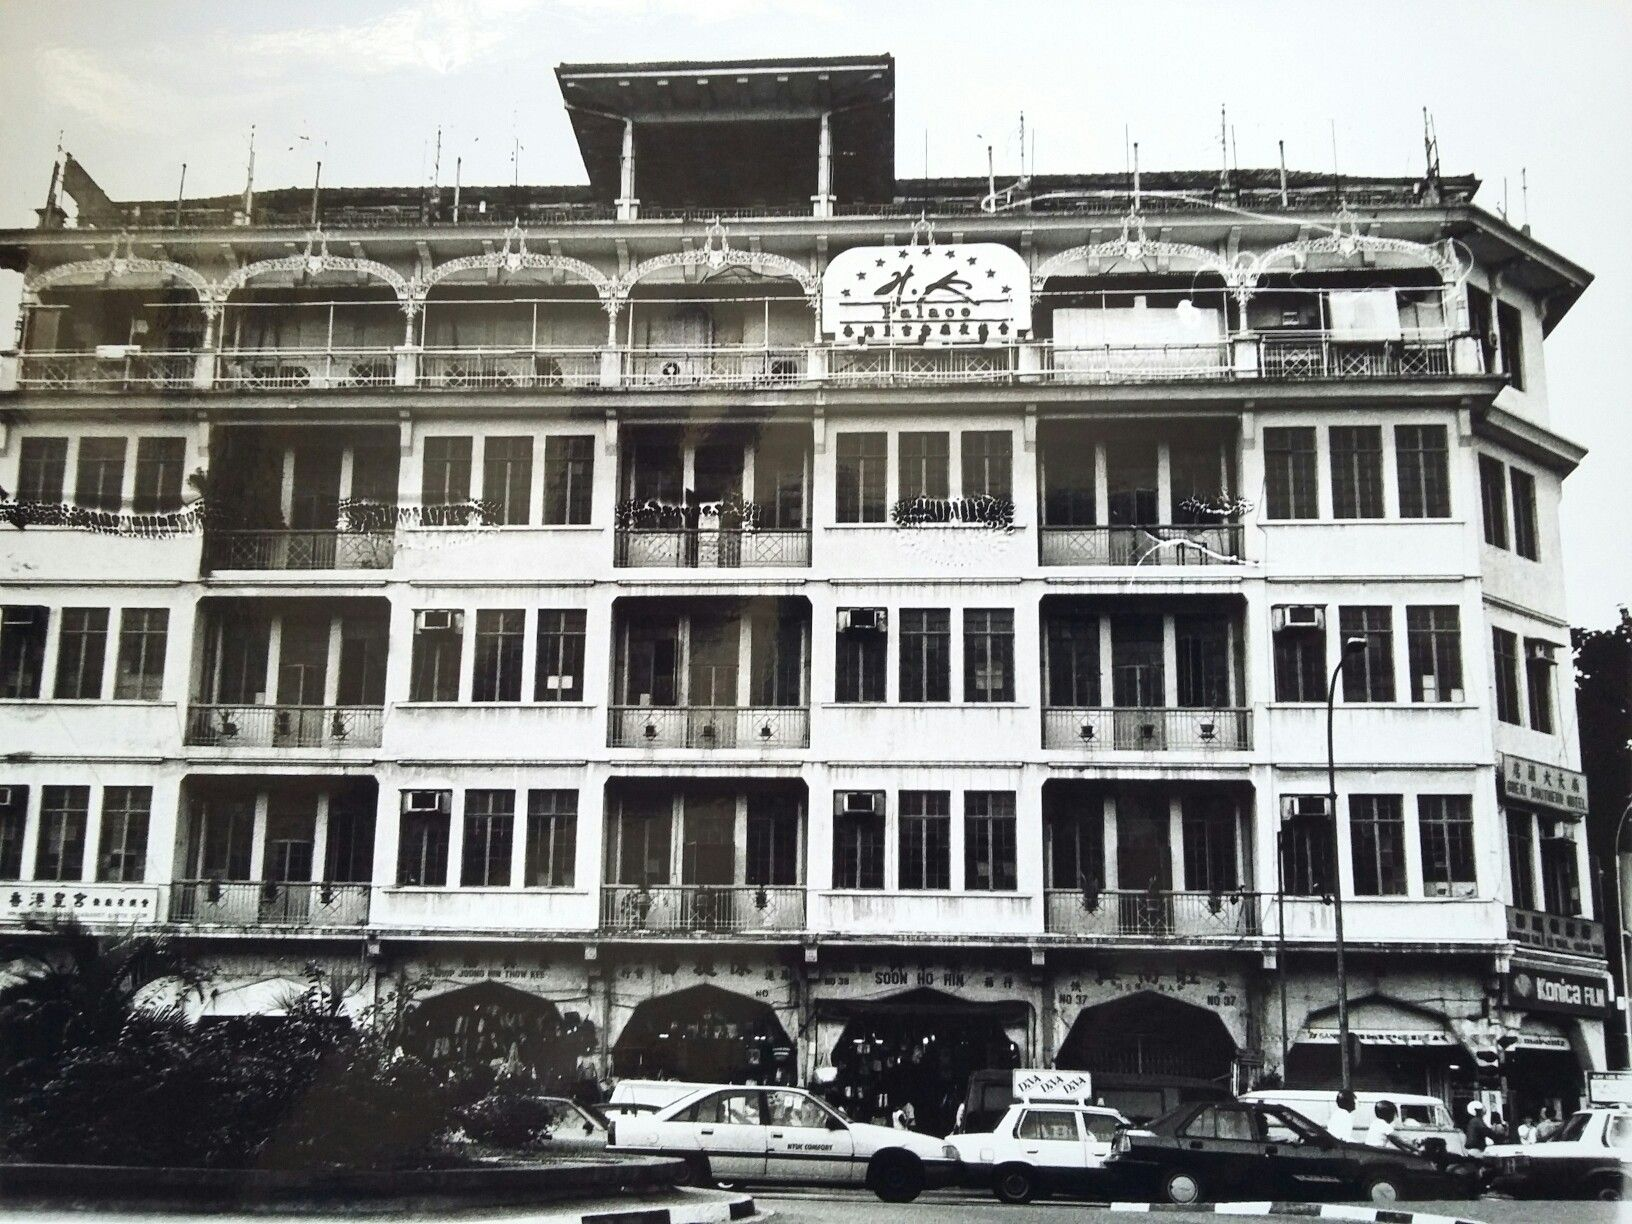 The Great Southern Hotel Nam Tin Along Eu Tong Sen Street Early 90s Singapore Photos Hong Kong Hotels Singapore